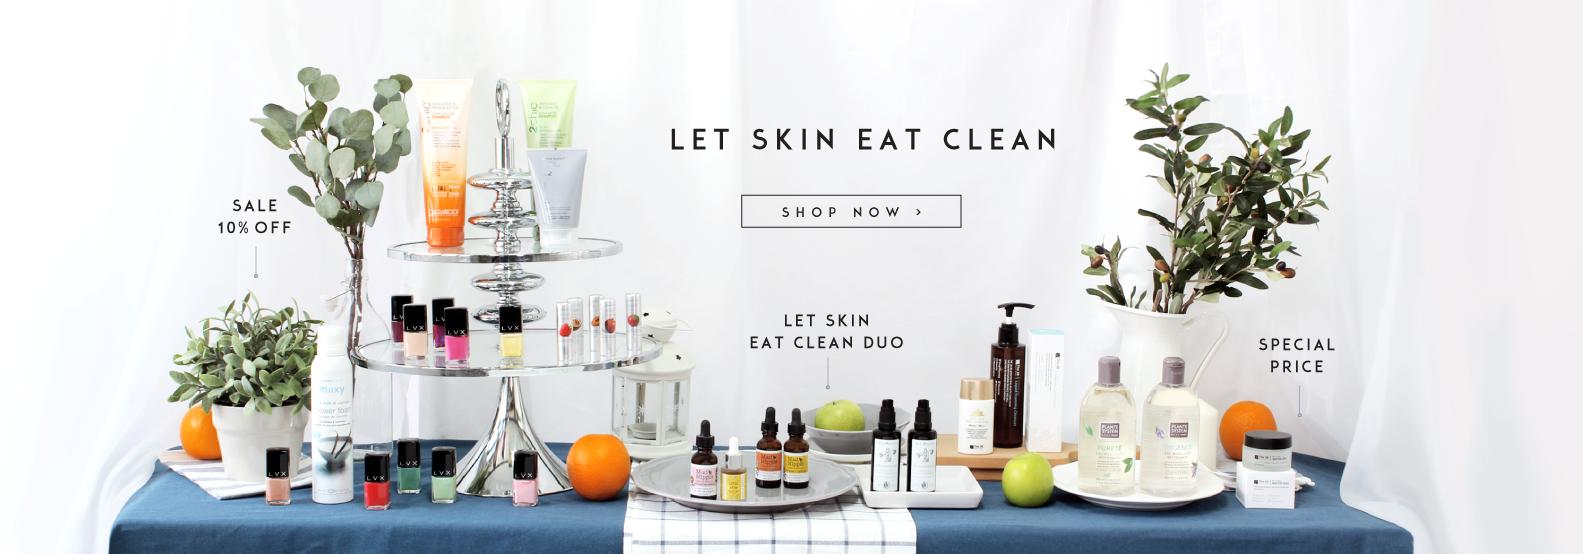 1583x554px_Let-skin-eat-clean-1